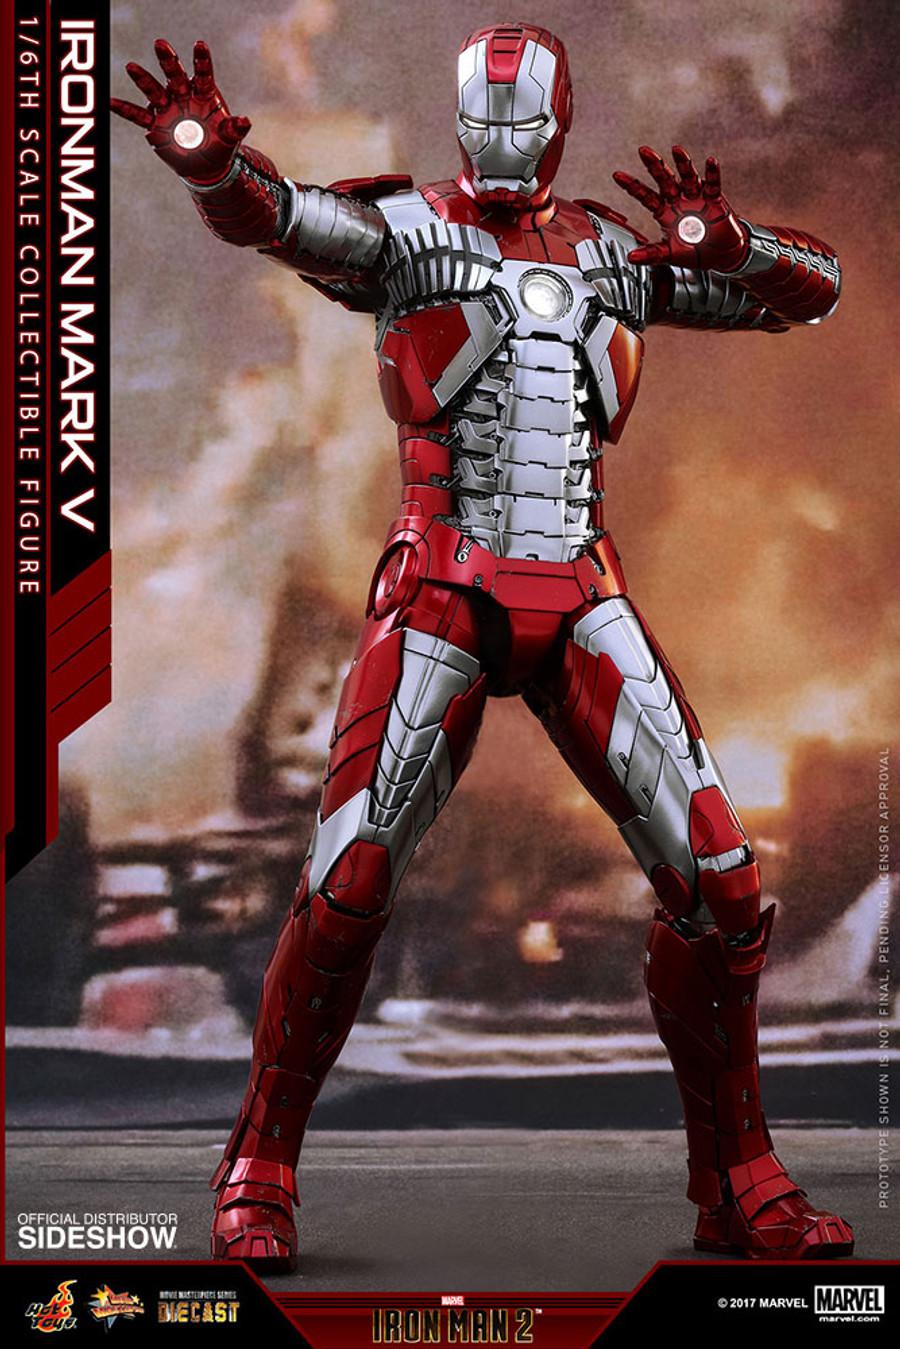 Hot Toys - Iron Man 2 -  Iron Man Mark V Diecast Movie Masterpiece